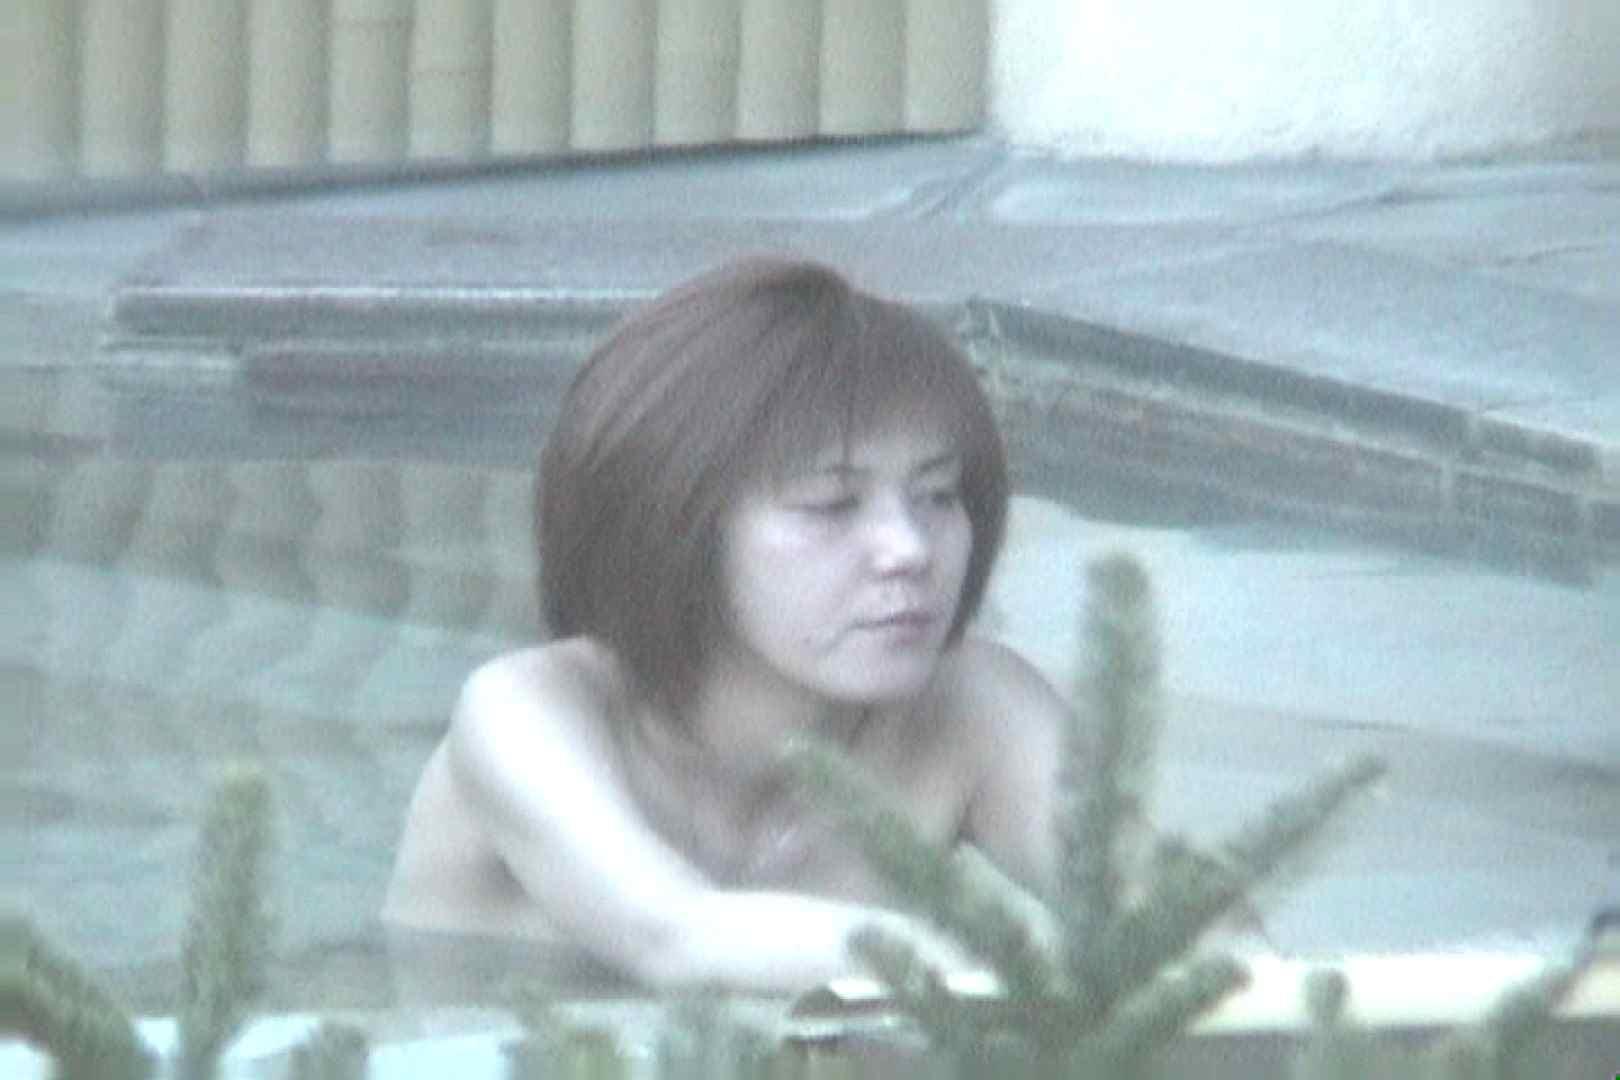 Aquaな露天風呂Vol.560 OLのエロ生活 オマンコ無修正動画無料 46連発 29